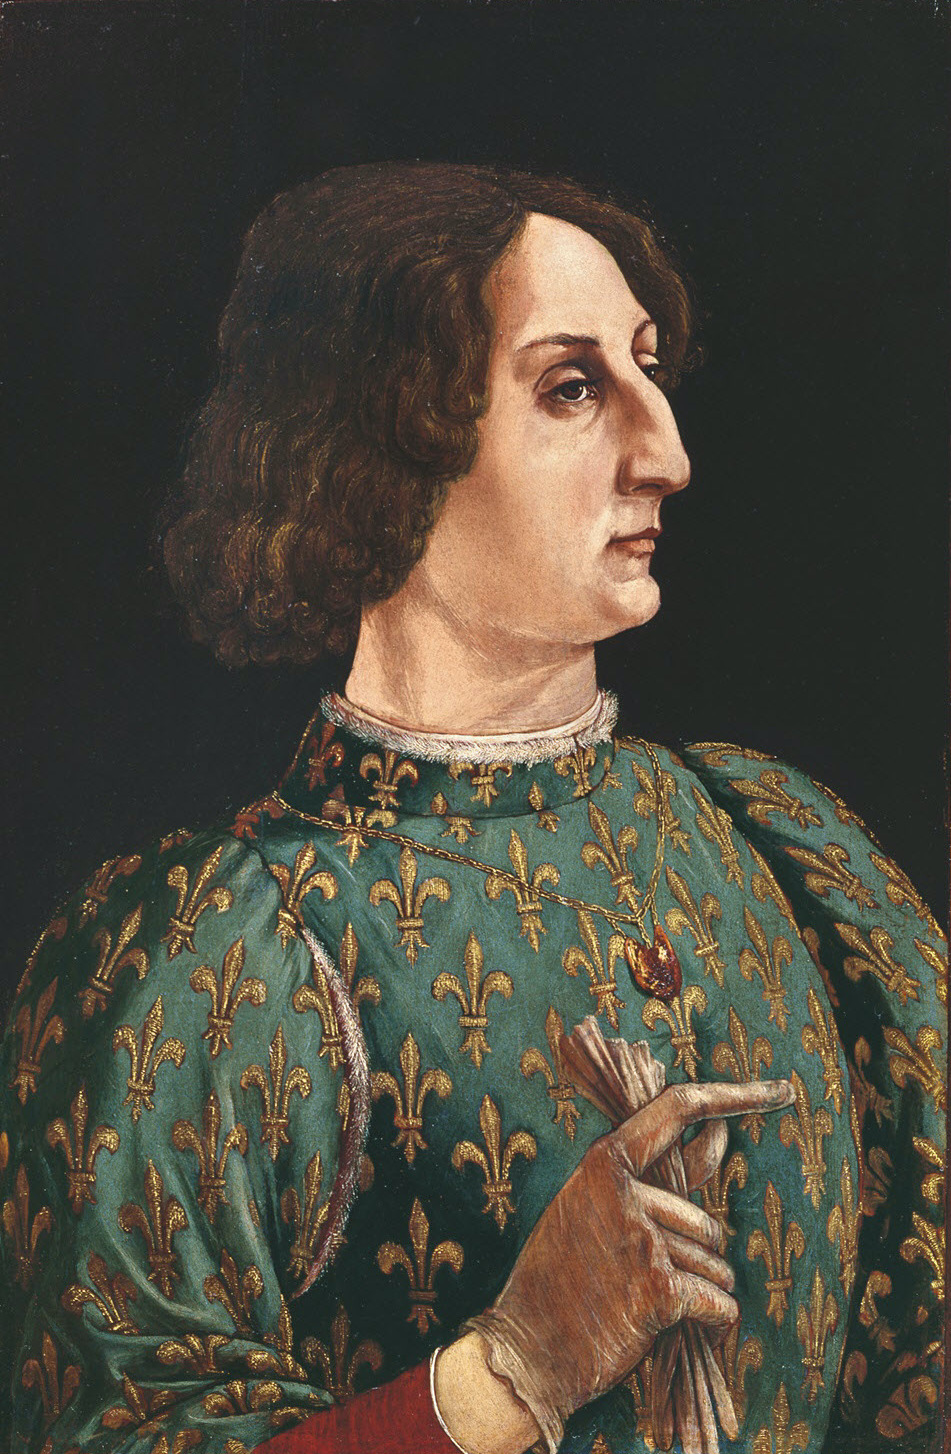 A New Duke of Milan